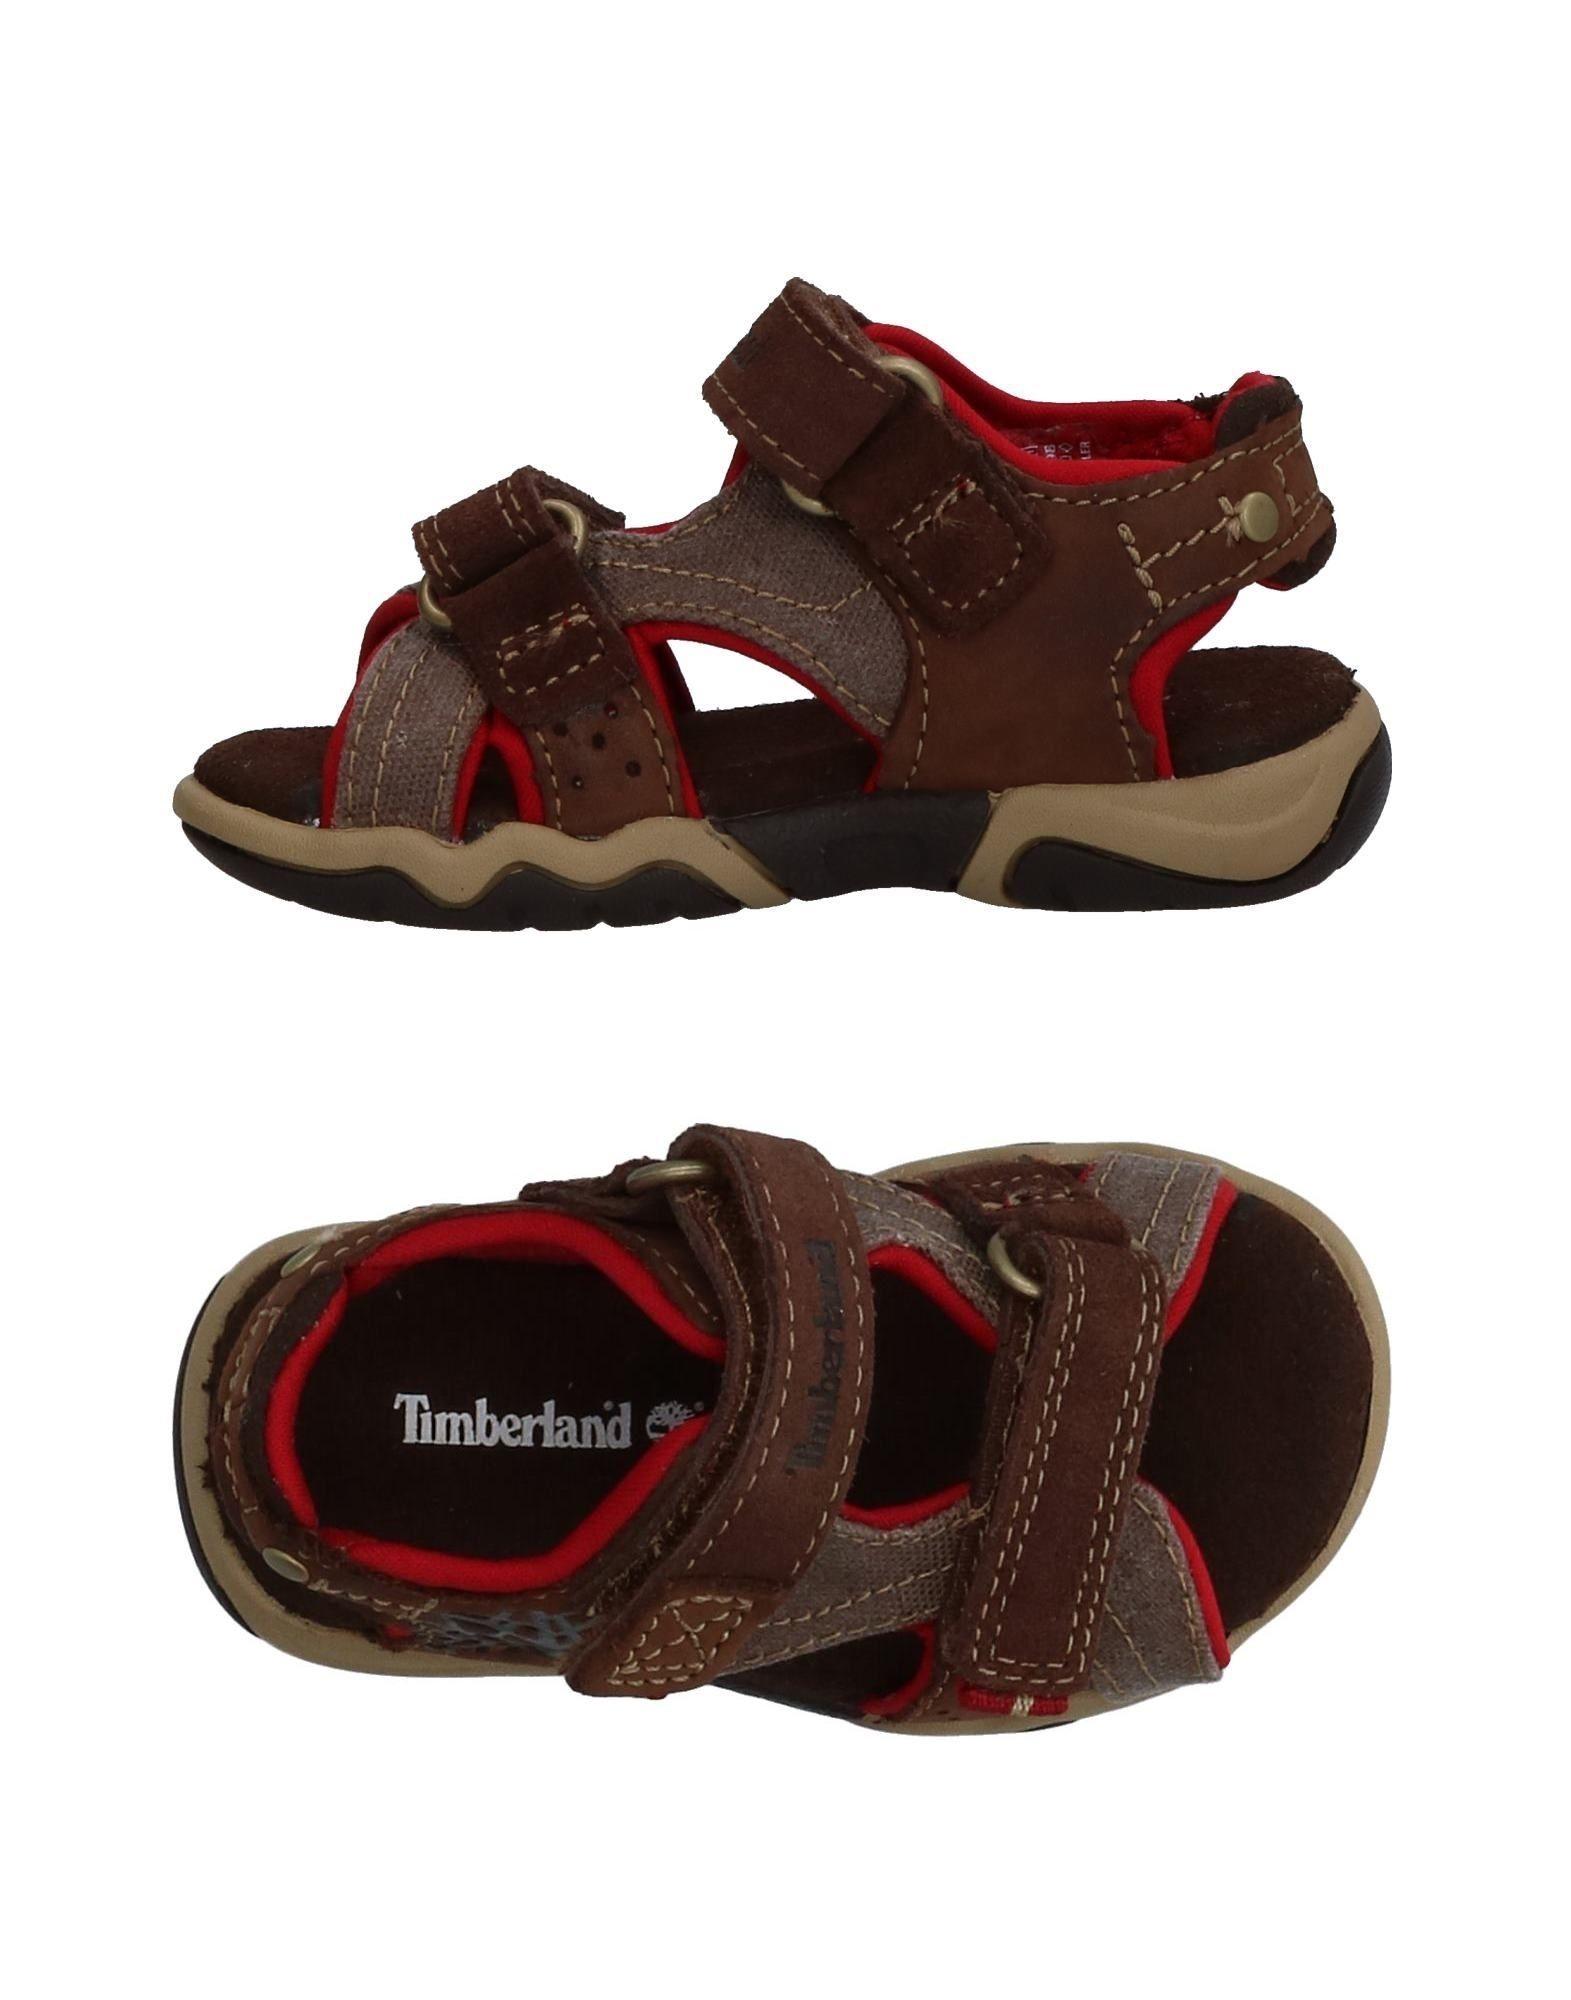 Timberland - Footwear - Sandals - On Yoox.com